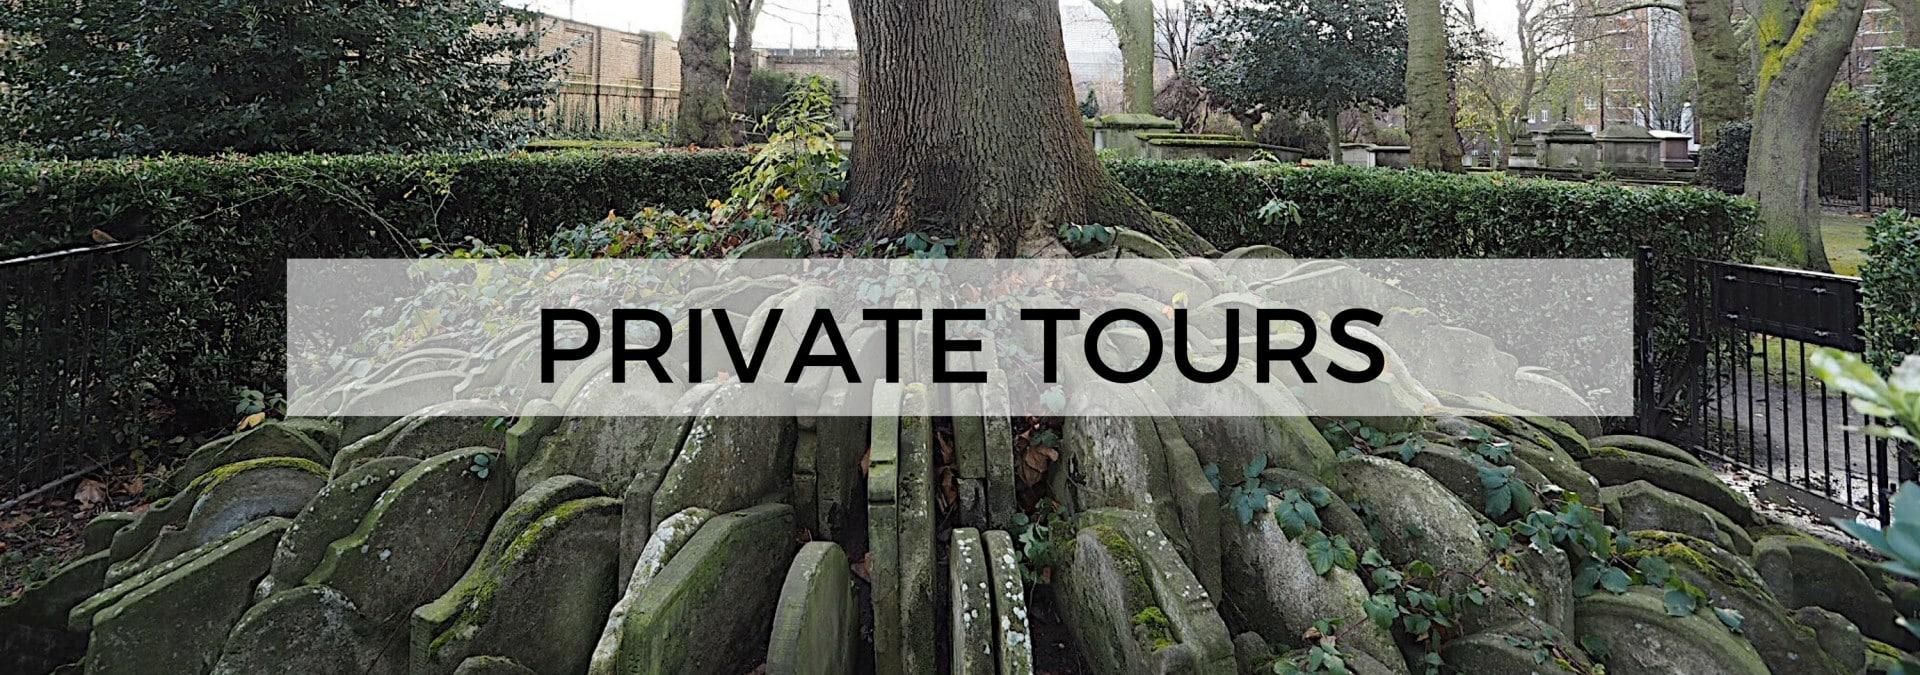 Private Tour London